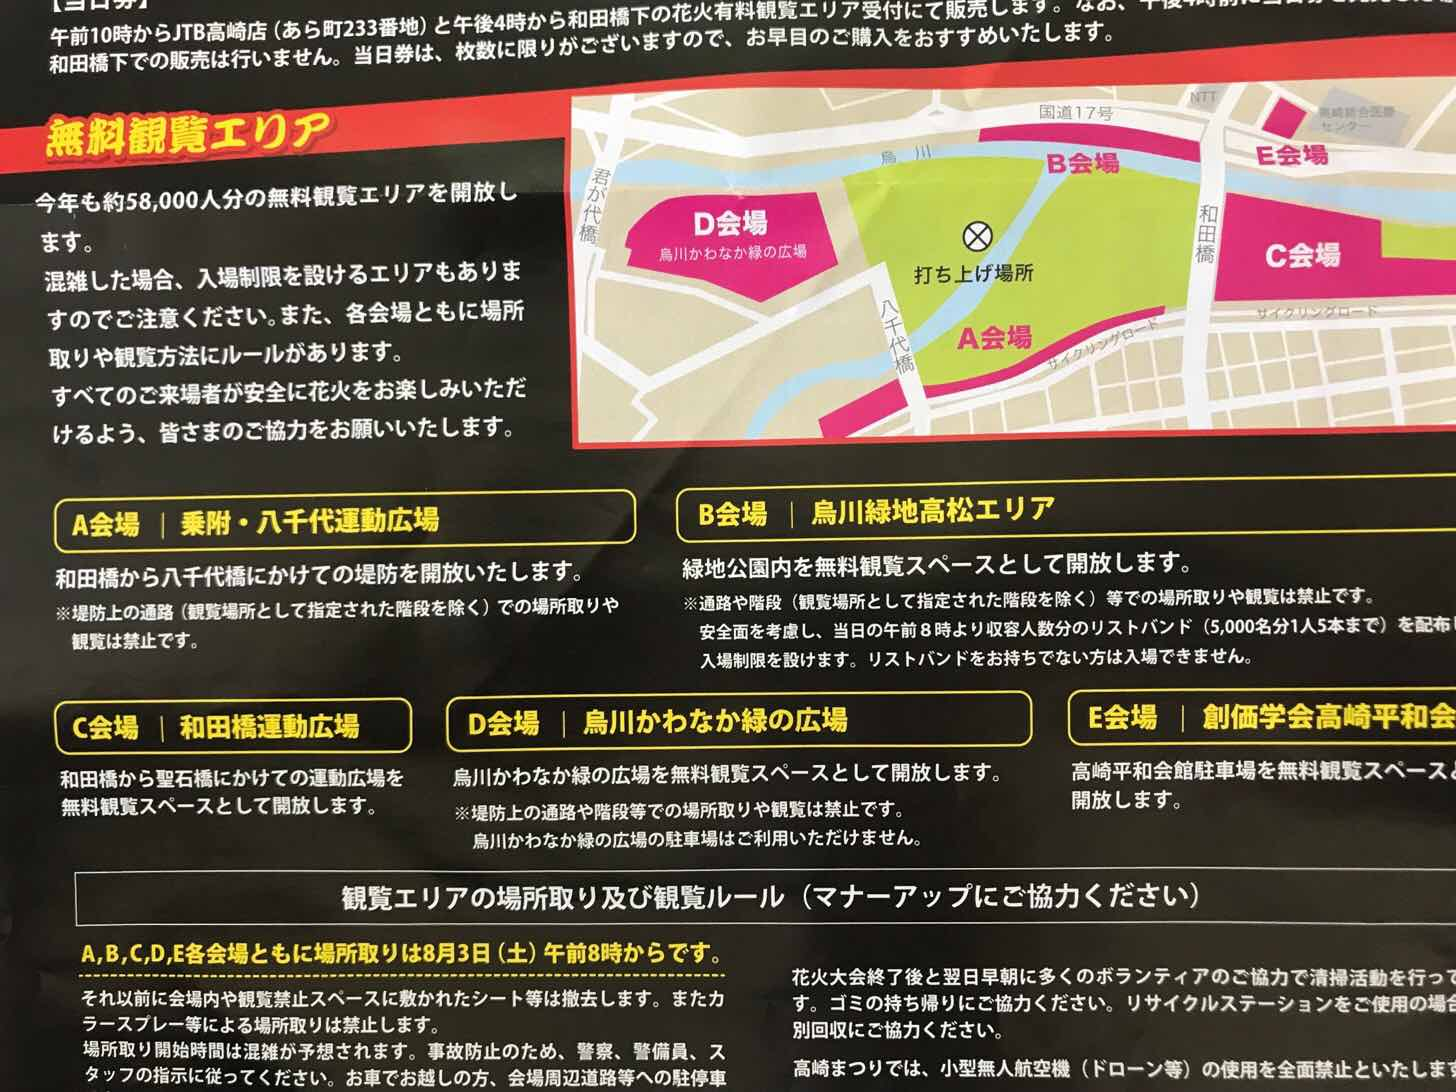 高崎祭り-花火-無料席